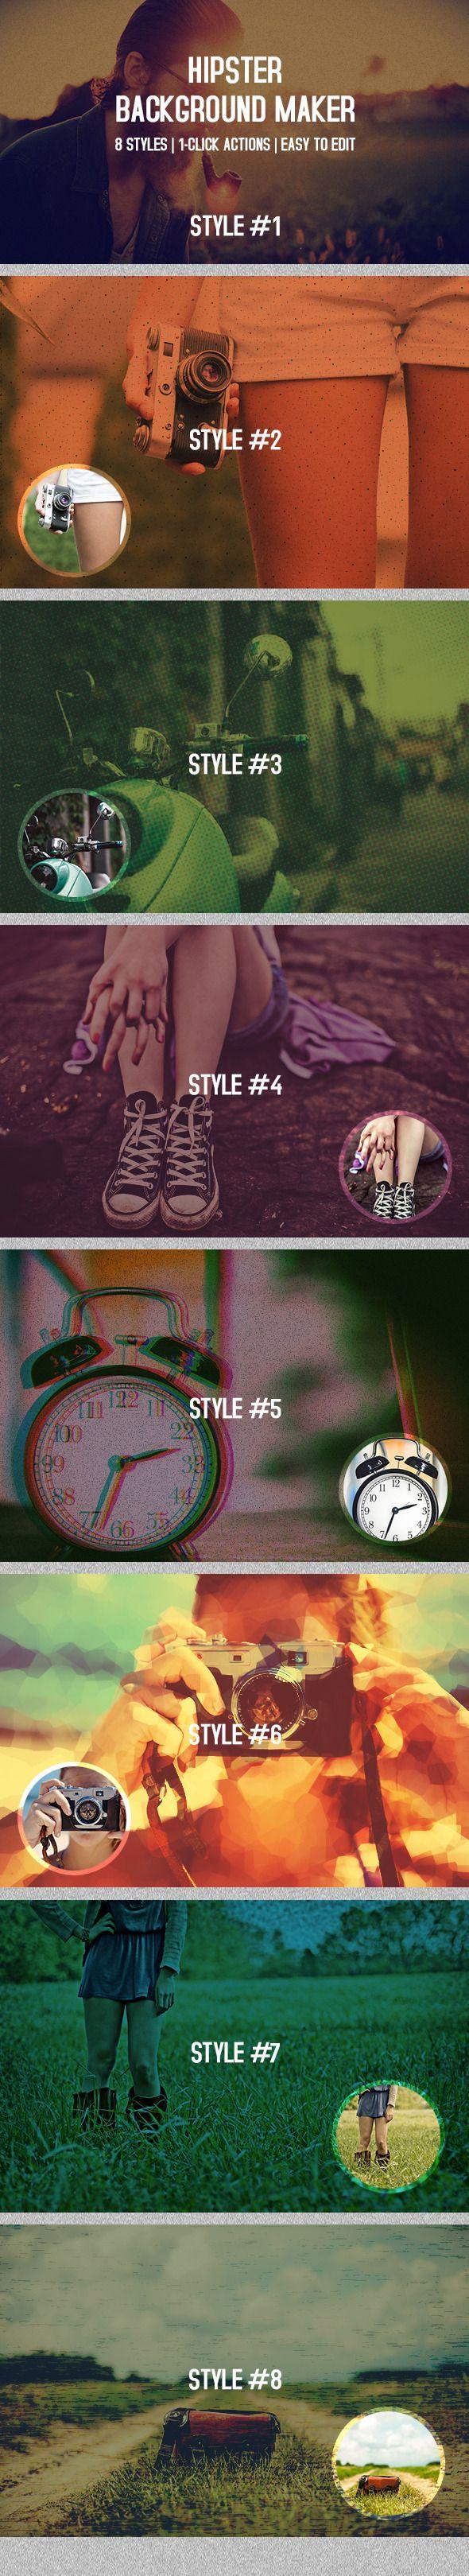 Hipster Web Background Maker (action, atn, background, bg, blue, cool, dark, dark background, dot, dotted, grunge, head, headers, hipster, landing, landing page, line, modern, photo, photoshop, pixel, purple, retro, slider, text, trend, vintage, vintage photo, web, white text)